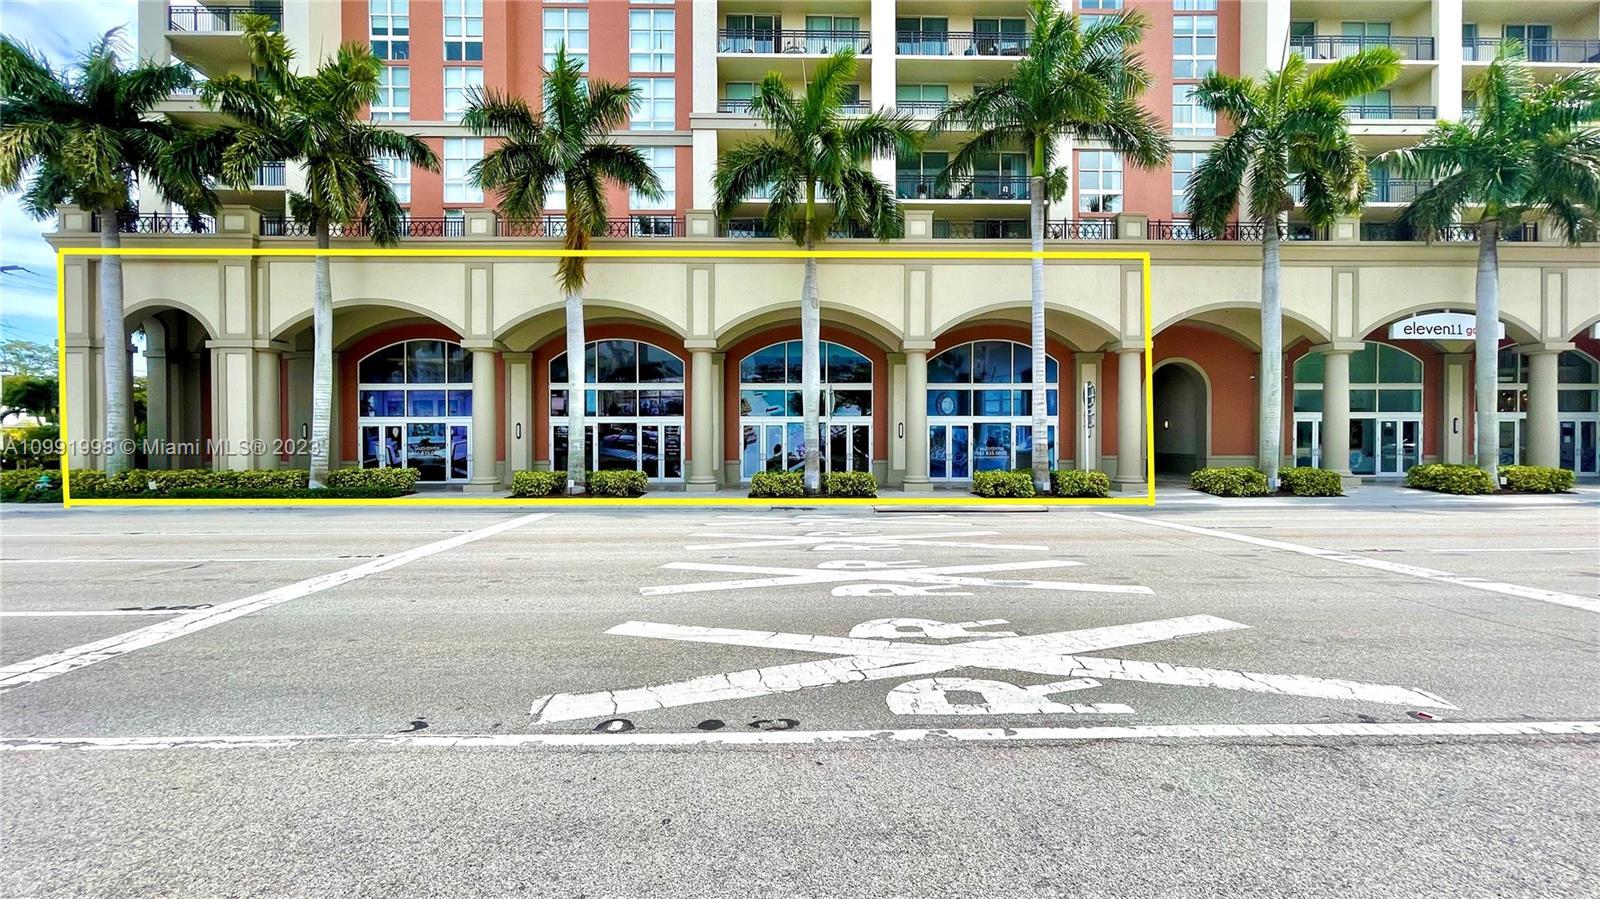 550 Okeechobee Blvd, West Palm Beach, Florida 33401